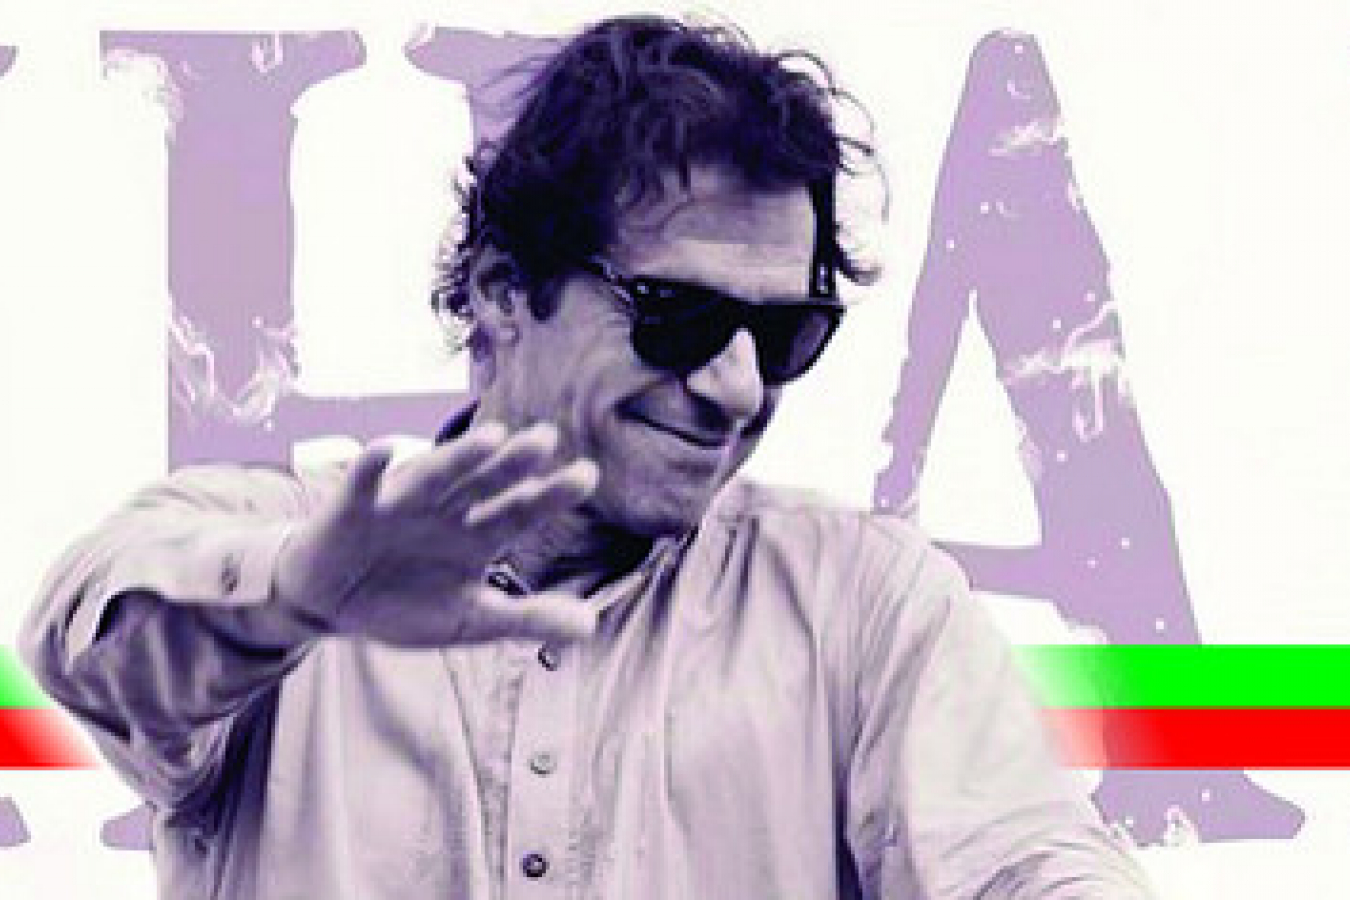 Imran Khan Oxford Graduate and former Captain of Pakistan Cricket Team